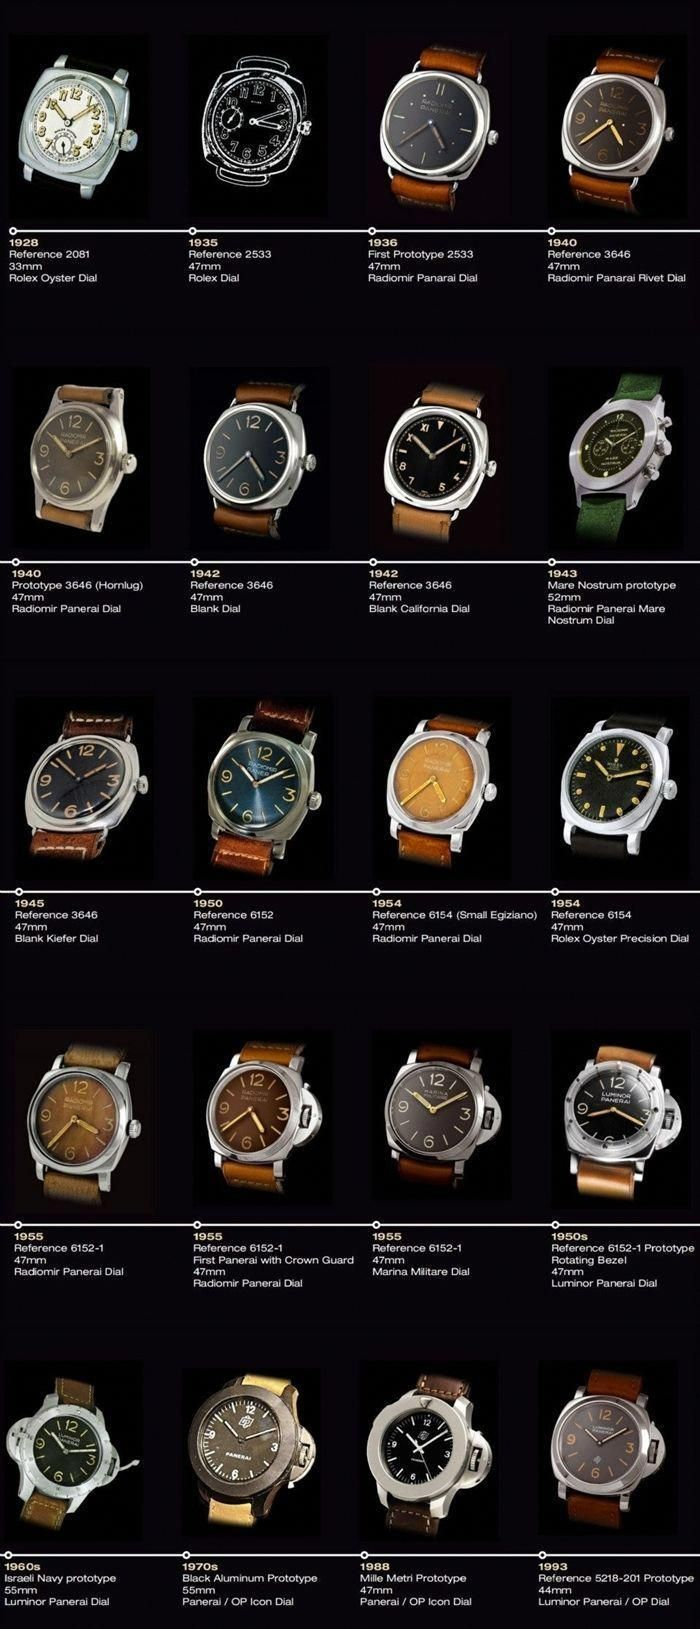 Panerai: Lover Panerai watches | The Idle Man | #StyleMadeEasy #luxurywatches